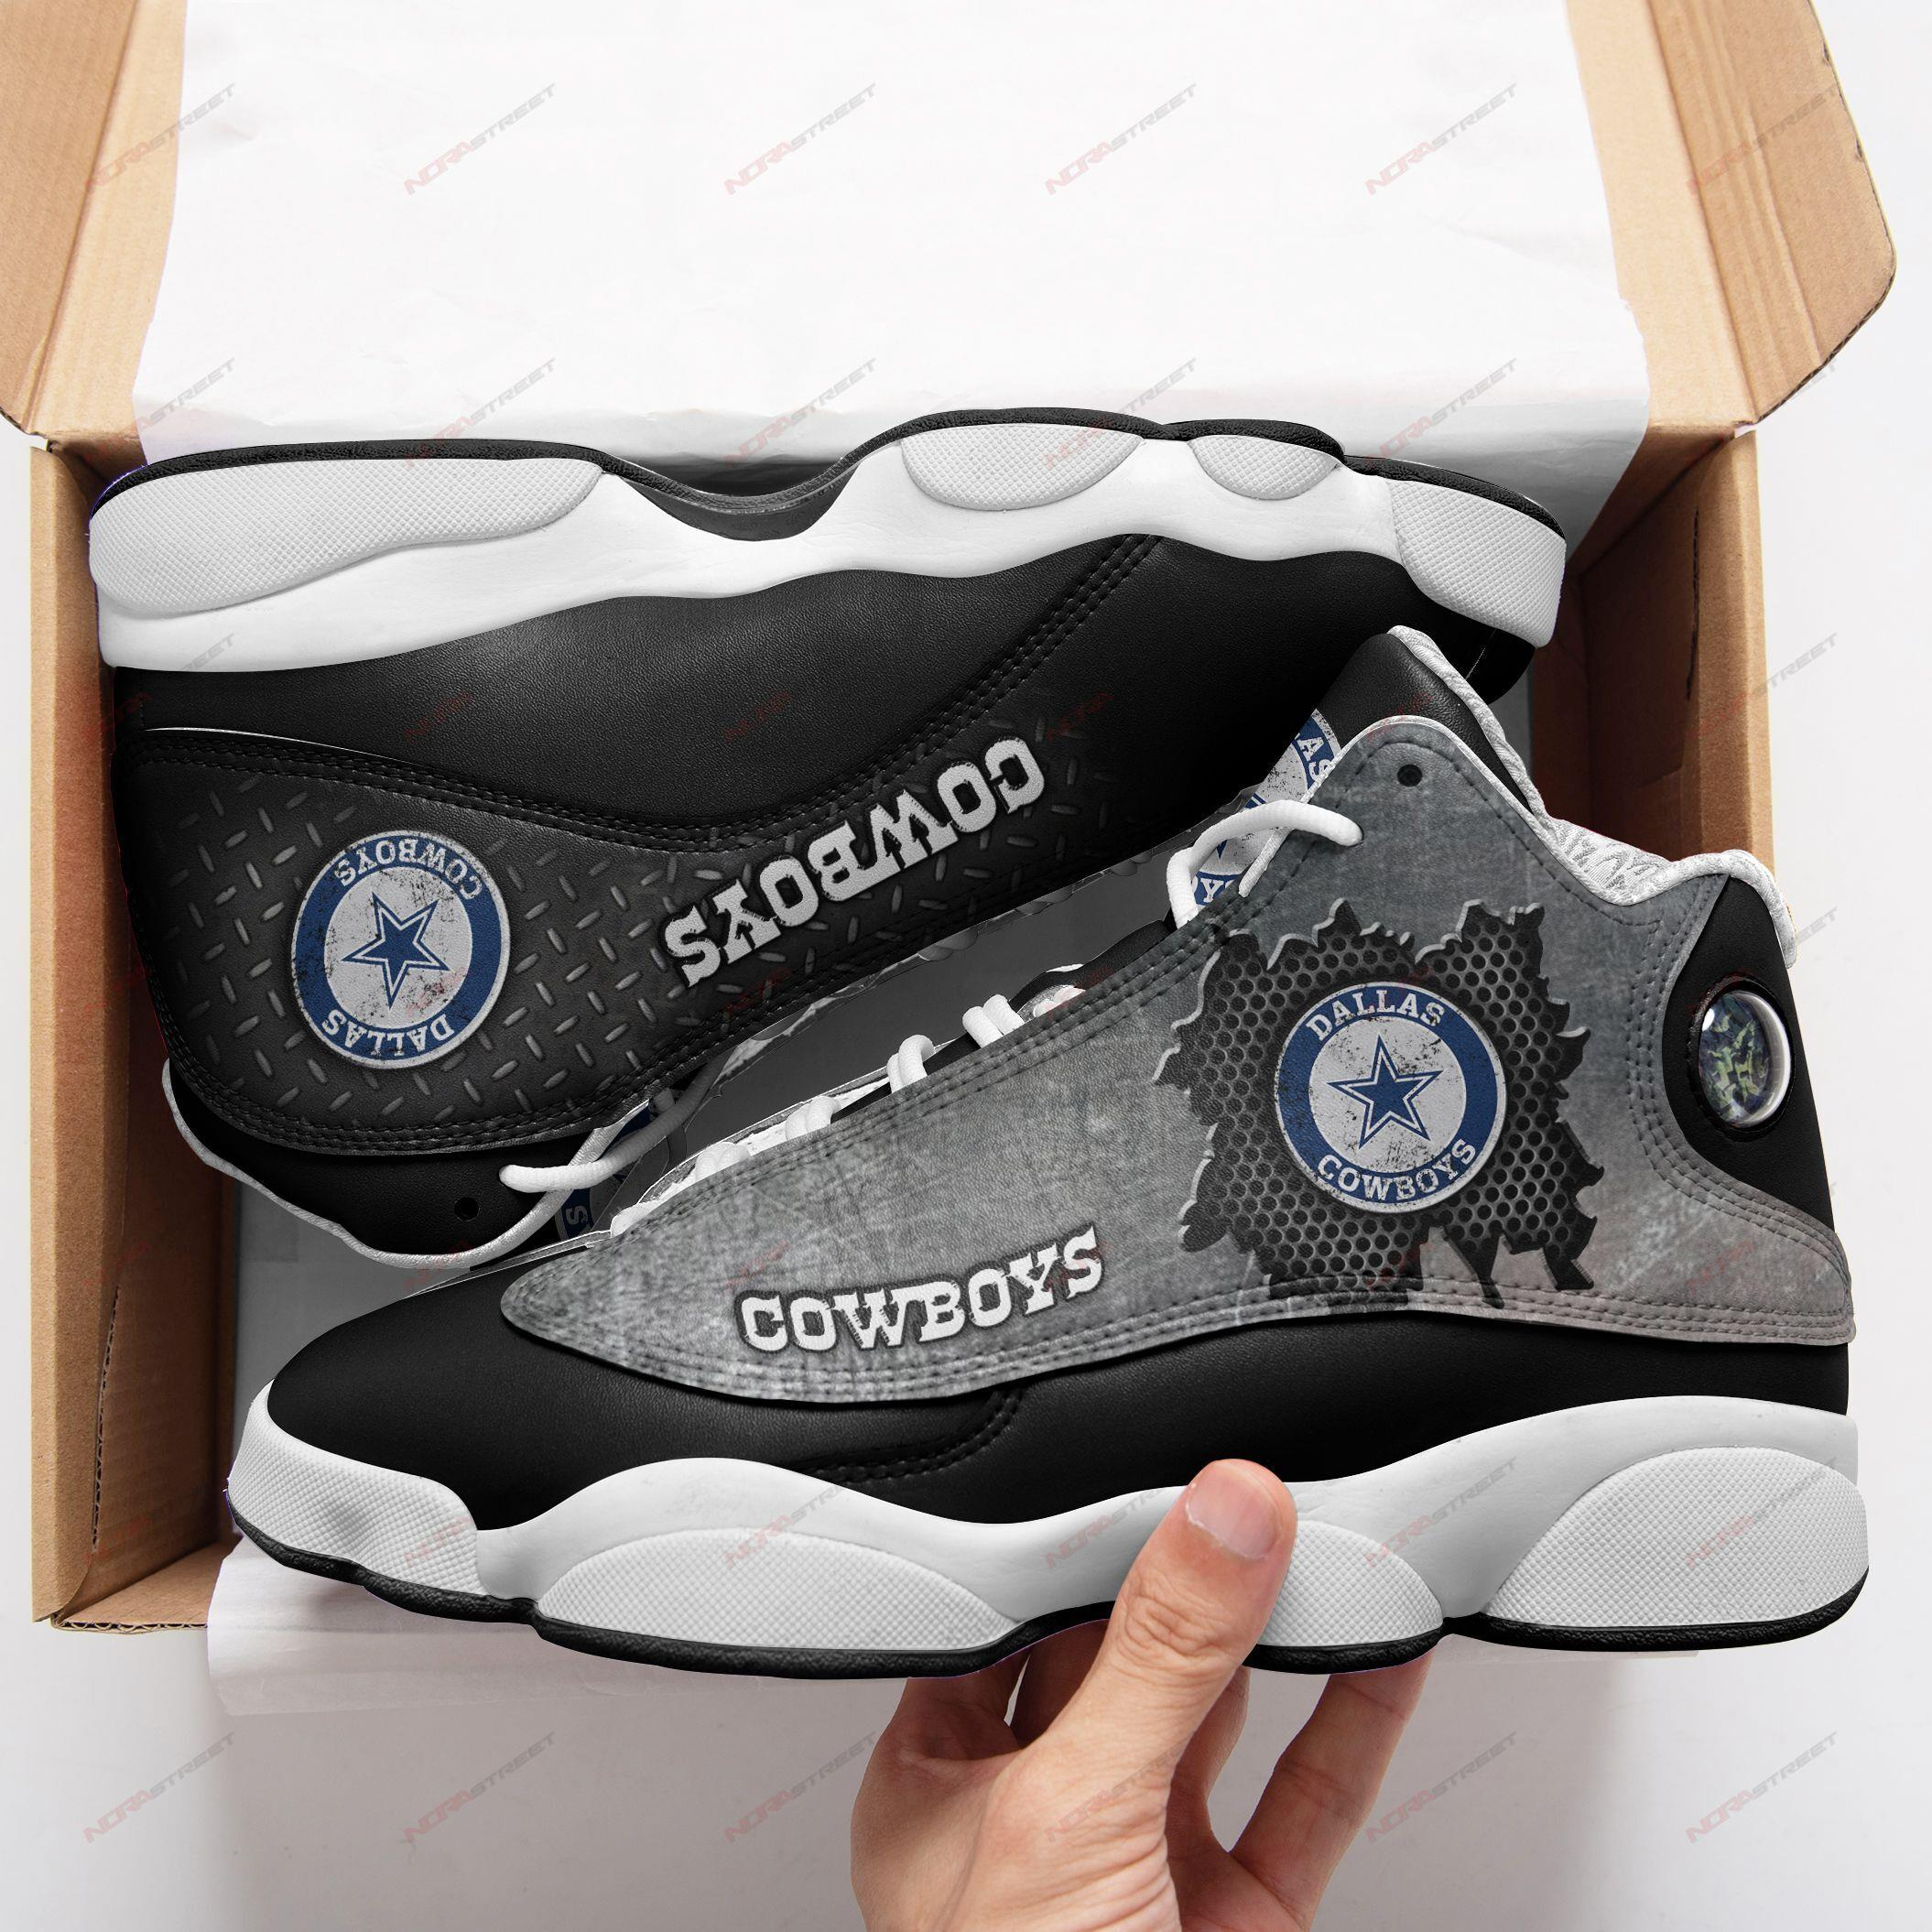 Dallas Cowboys Air Jordan 13 Sneakers Sport Shoes Full Size